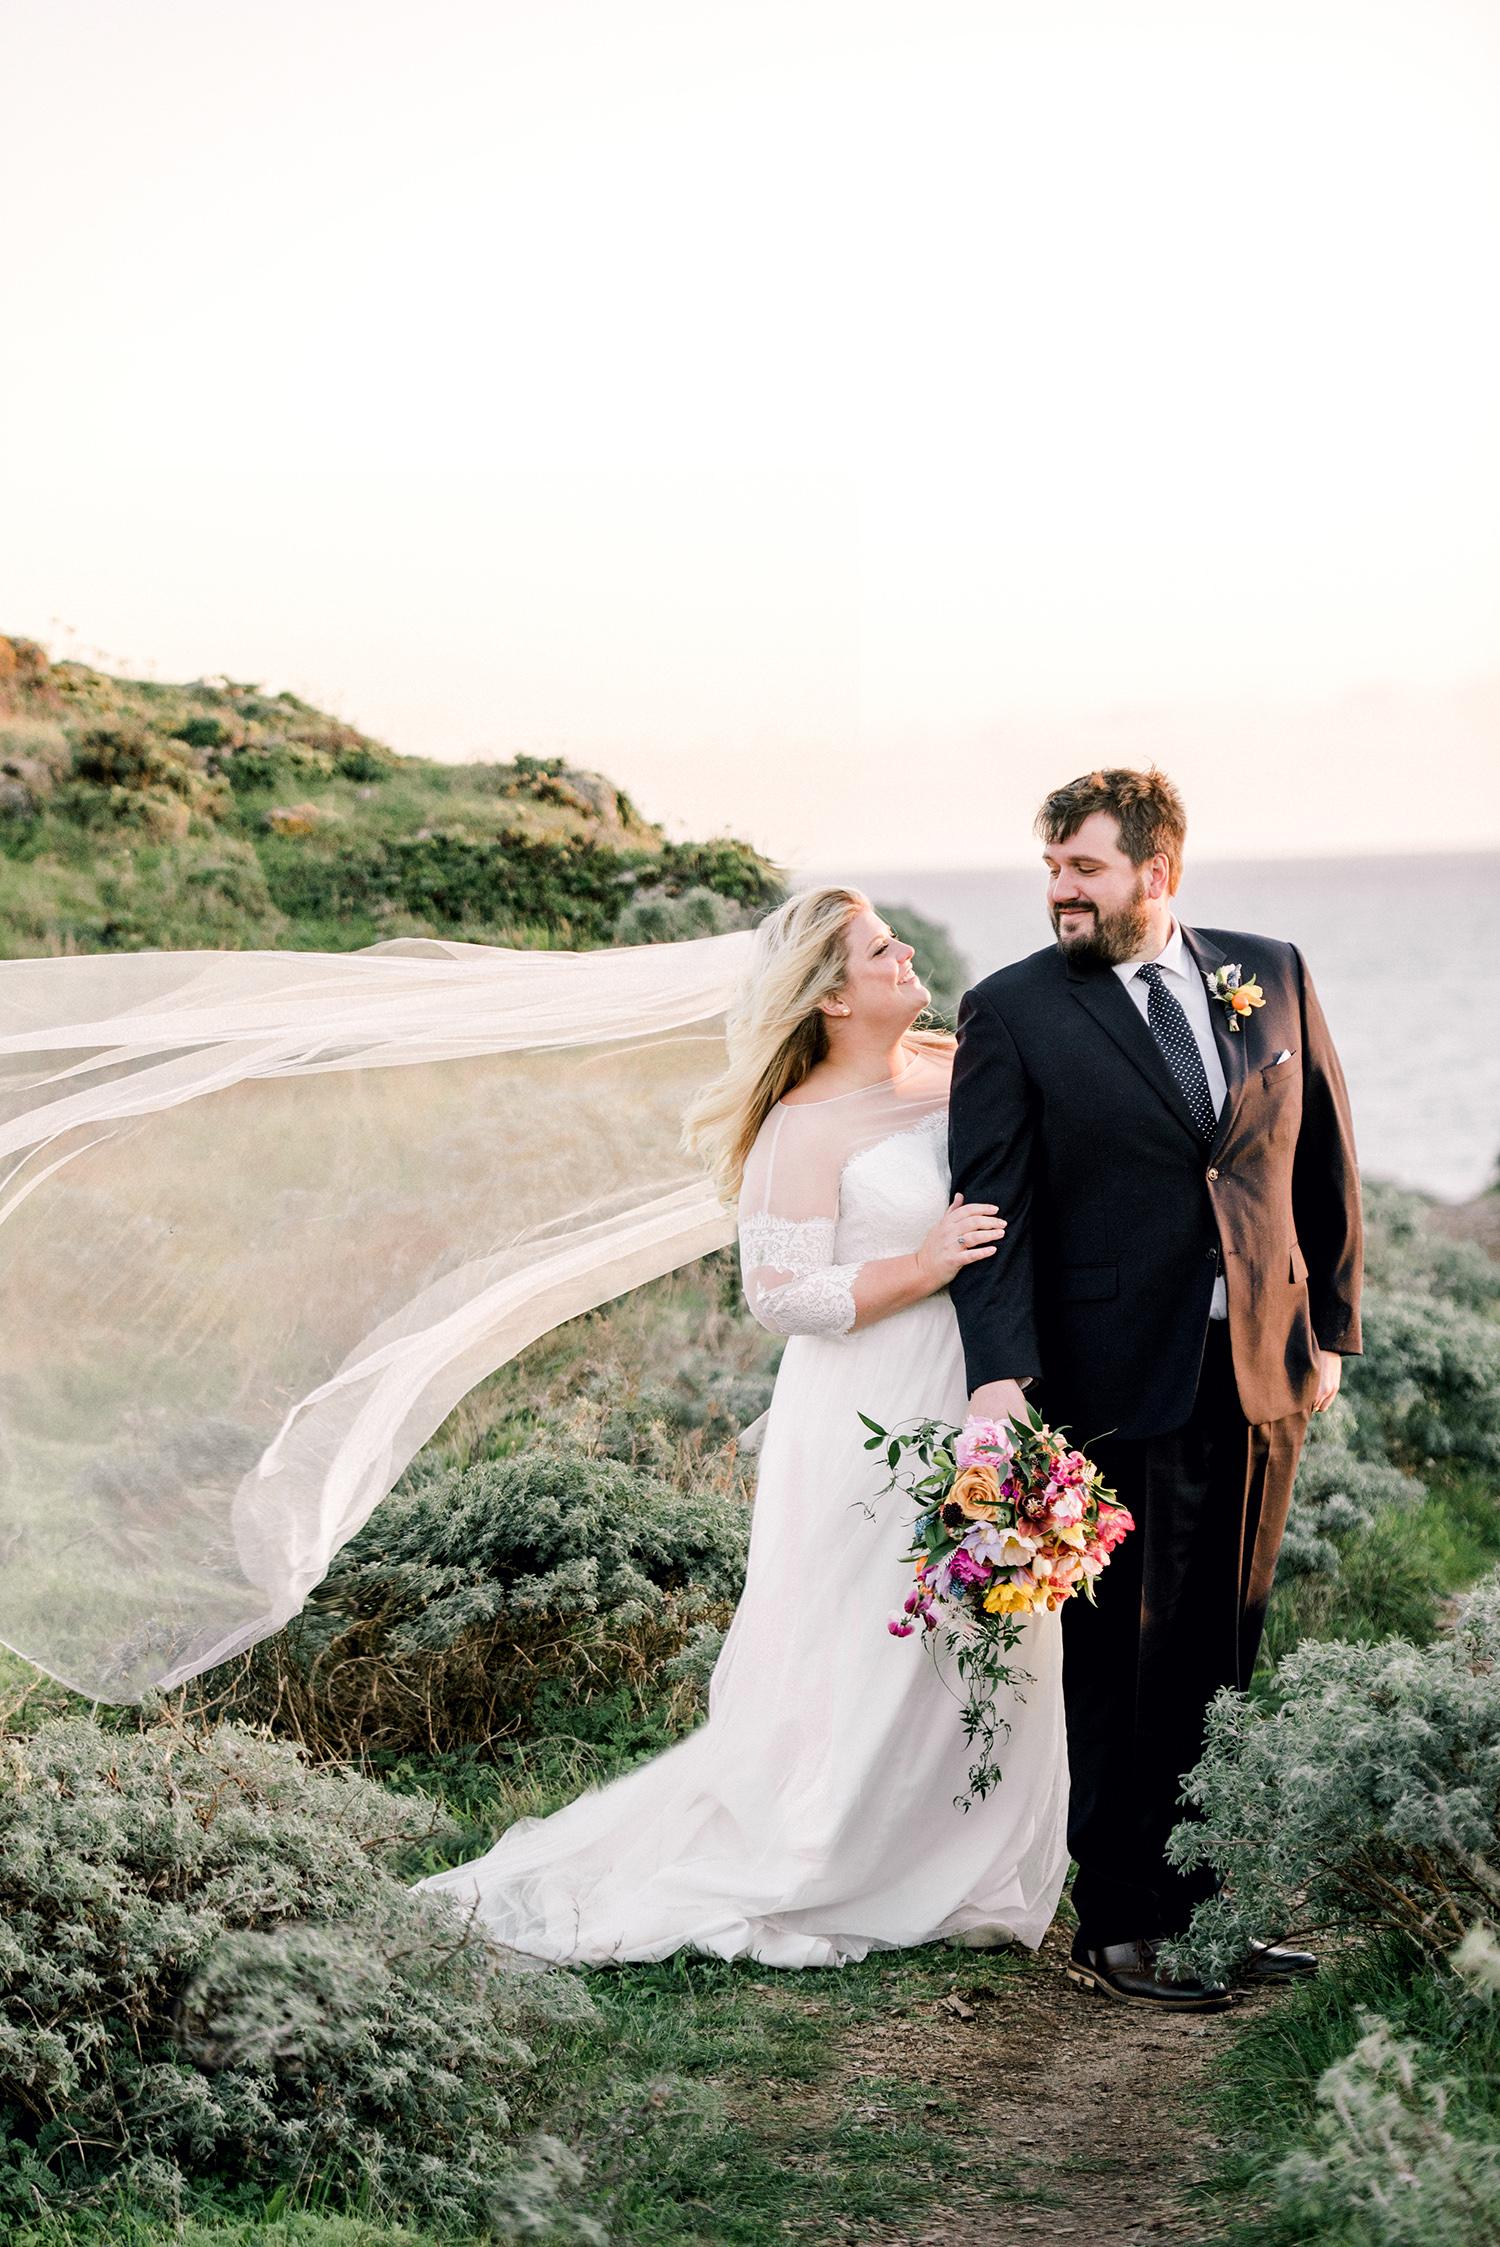 johanna erik wedding couple by water